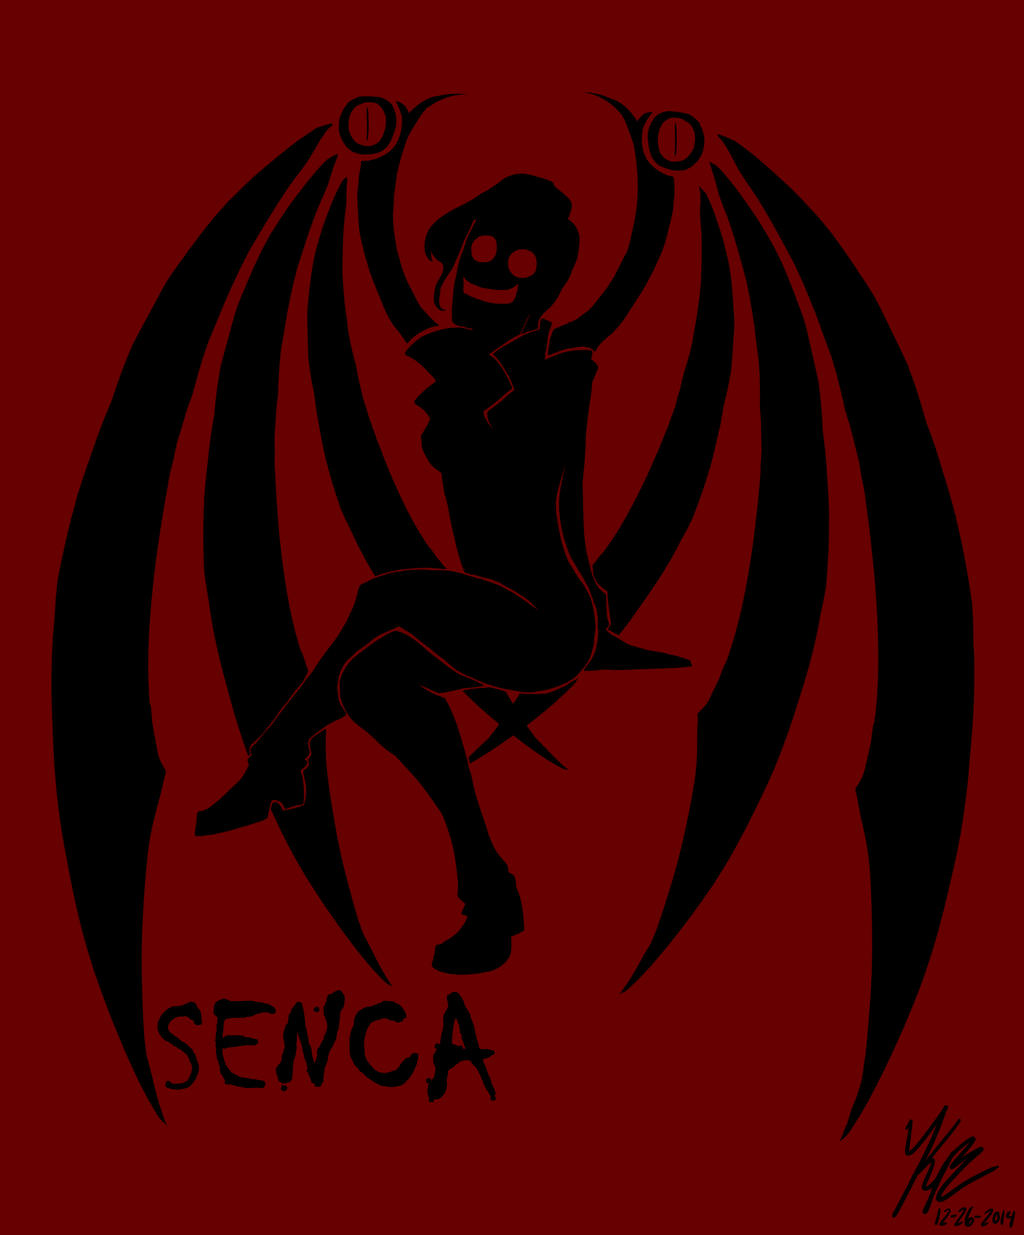 Senca Silhouette by HugaDuck